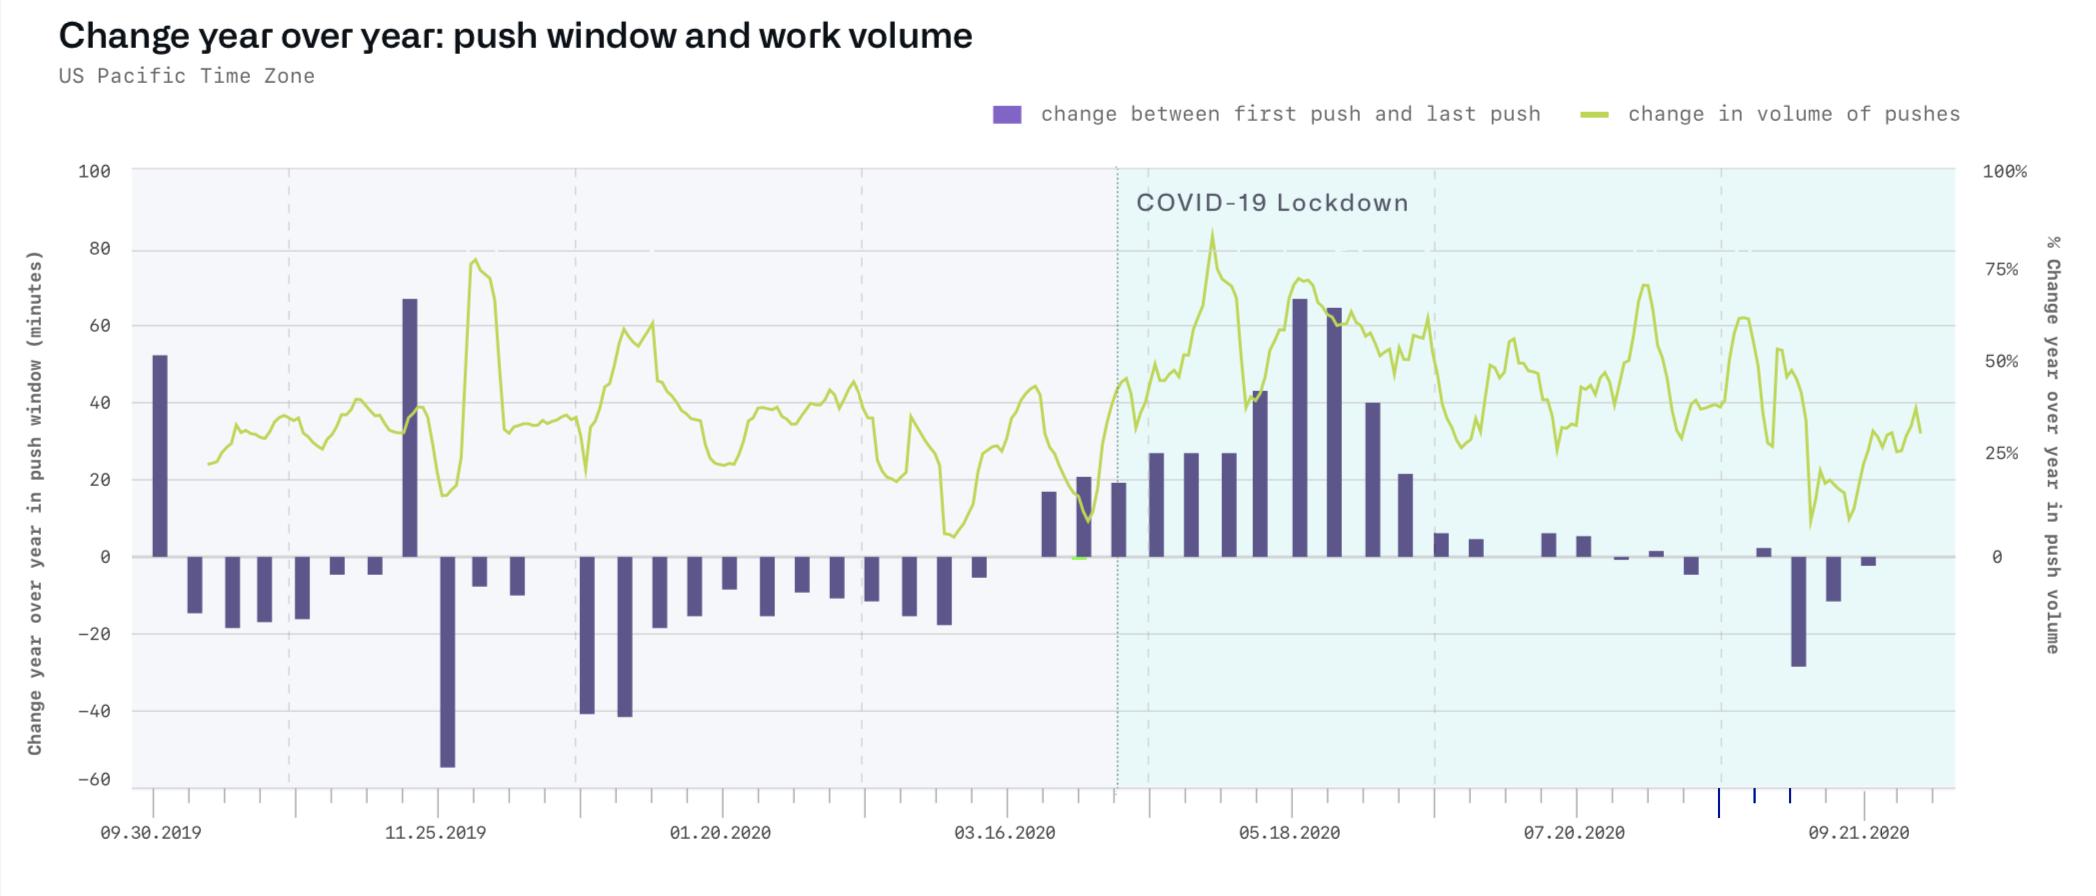 githubs-2020-octoverse报告状态的重点是开发人员正在工作数小时,但转向创意项目的开源项目GitHub的2020 Octoverse状态报告亮点:开发人员工作时间更多,但转向创意项目的开源项目